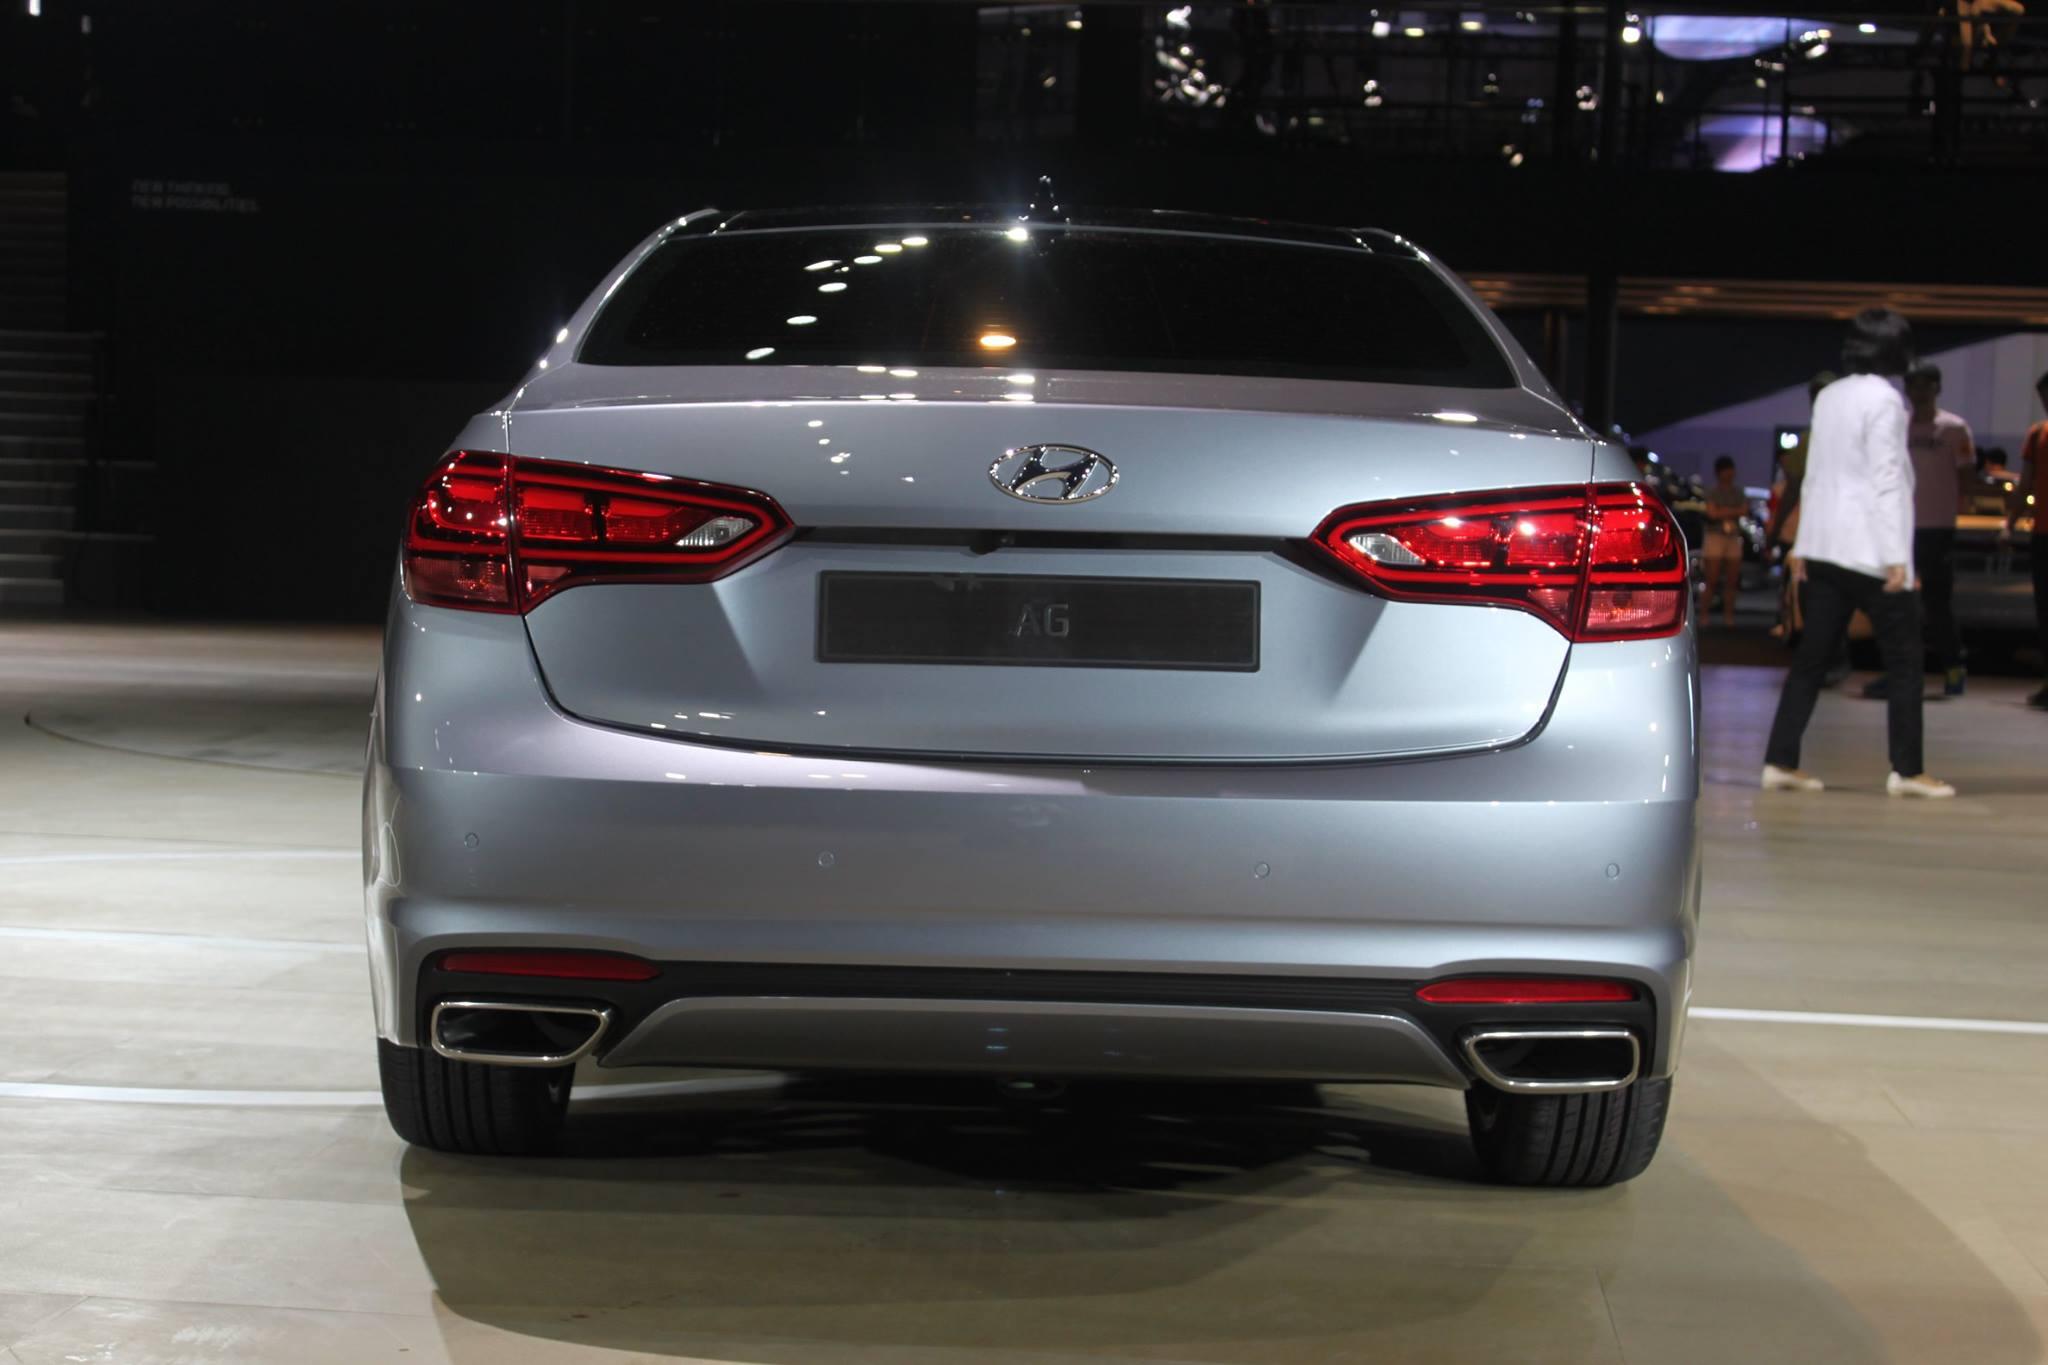 hyundai-ag-new-luxury-sedan (2)